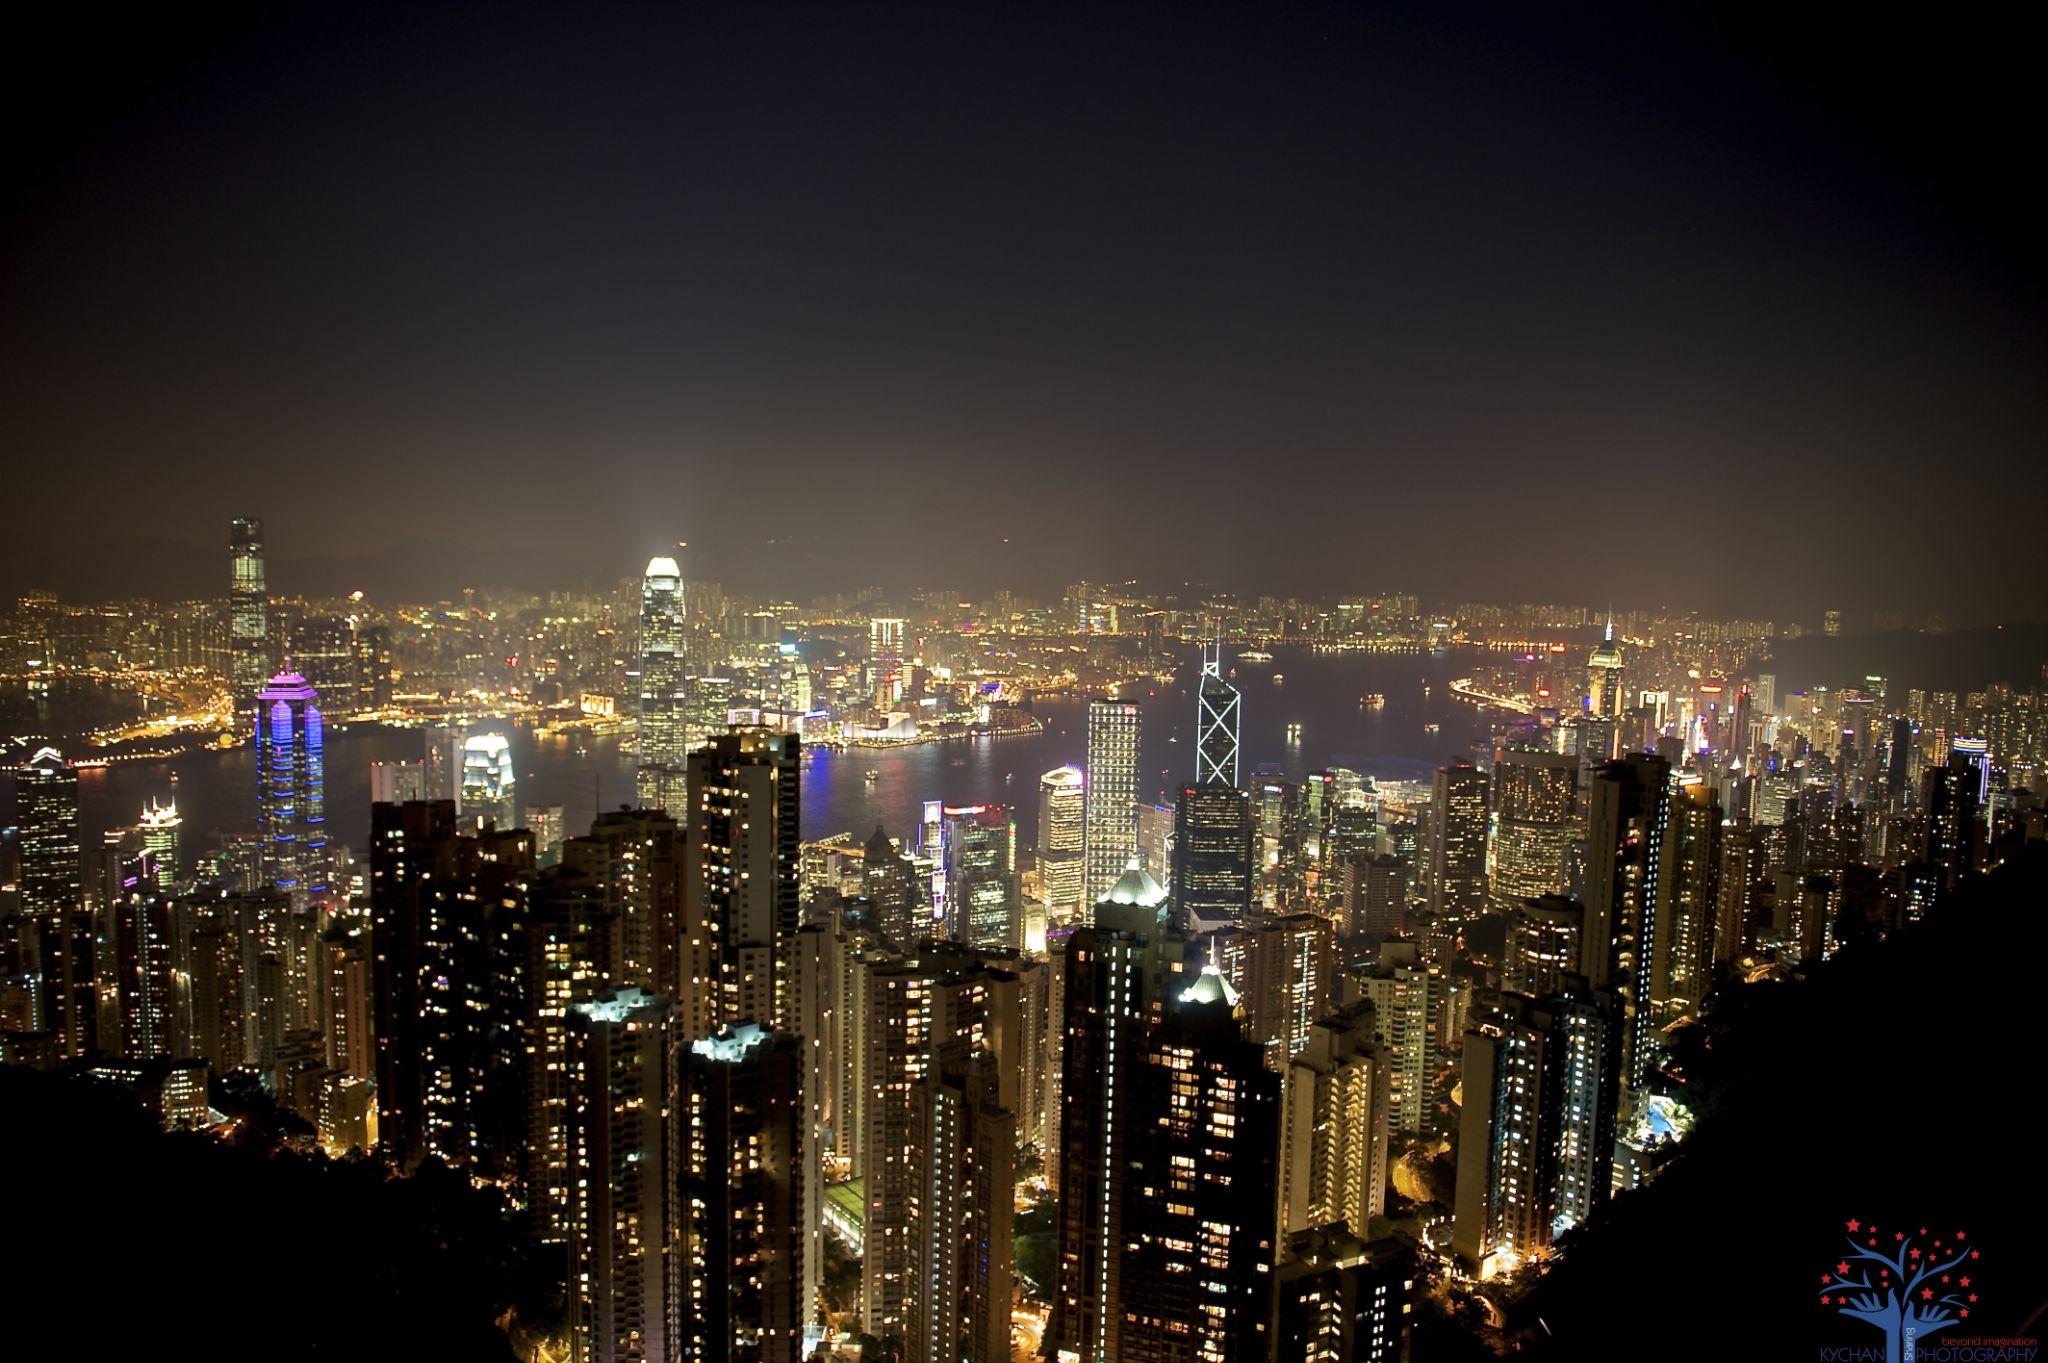 Hong Kong - The Peak view by Brandon Chan